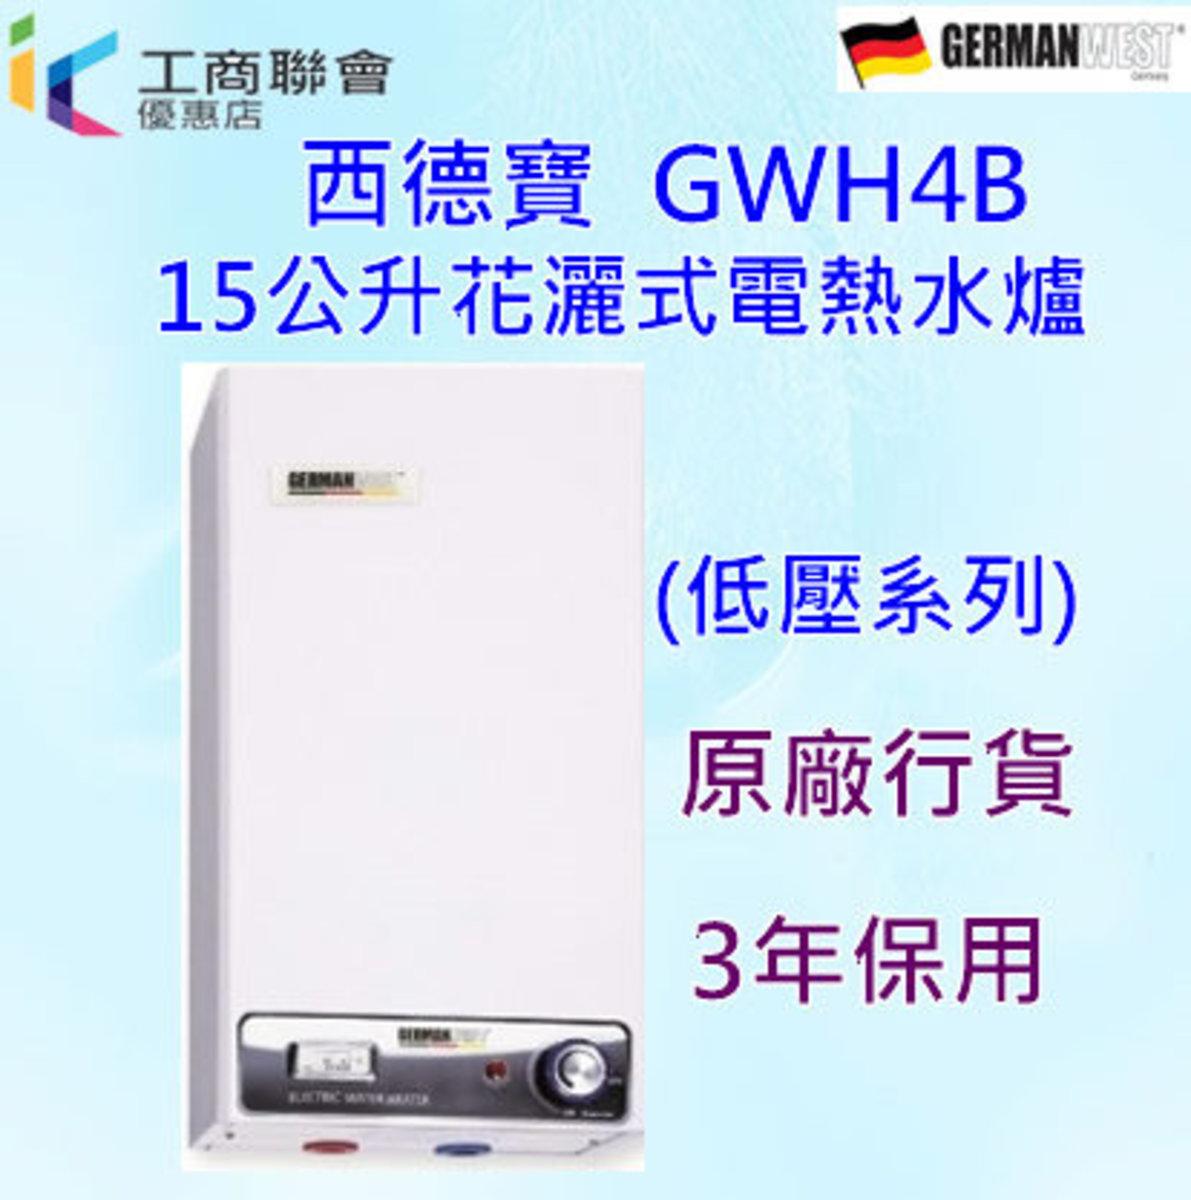 German West  GWH4B 15公升 花灑式電熱水爐